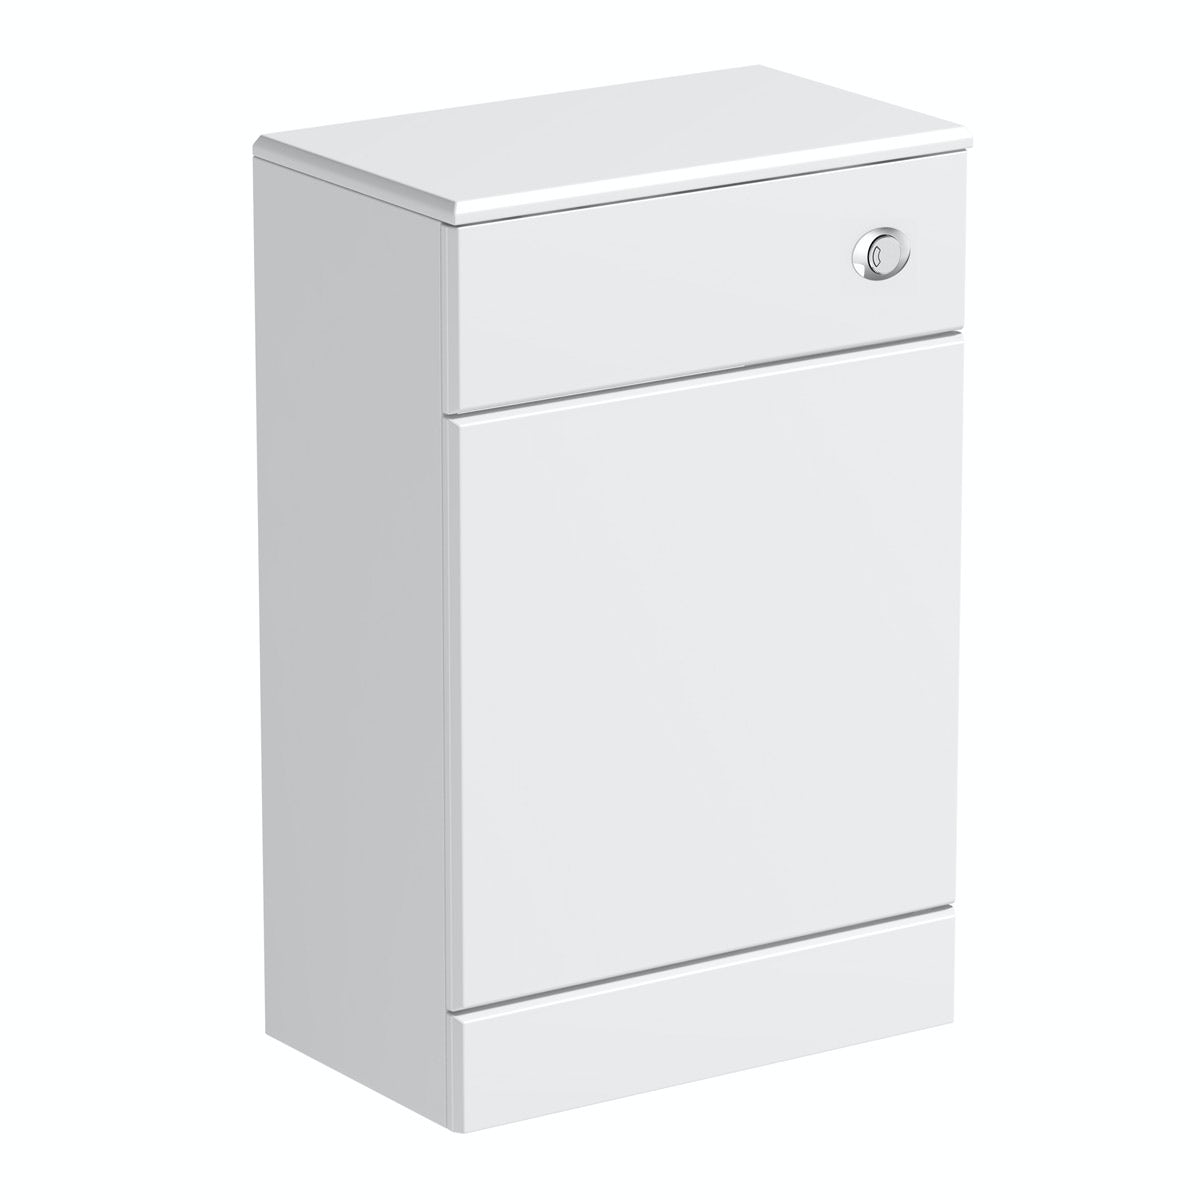 Slimline Bedroom Furniture Sienna White Slimline Back To Wall Toilet Unit Victoriaplumcom